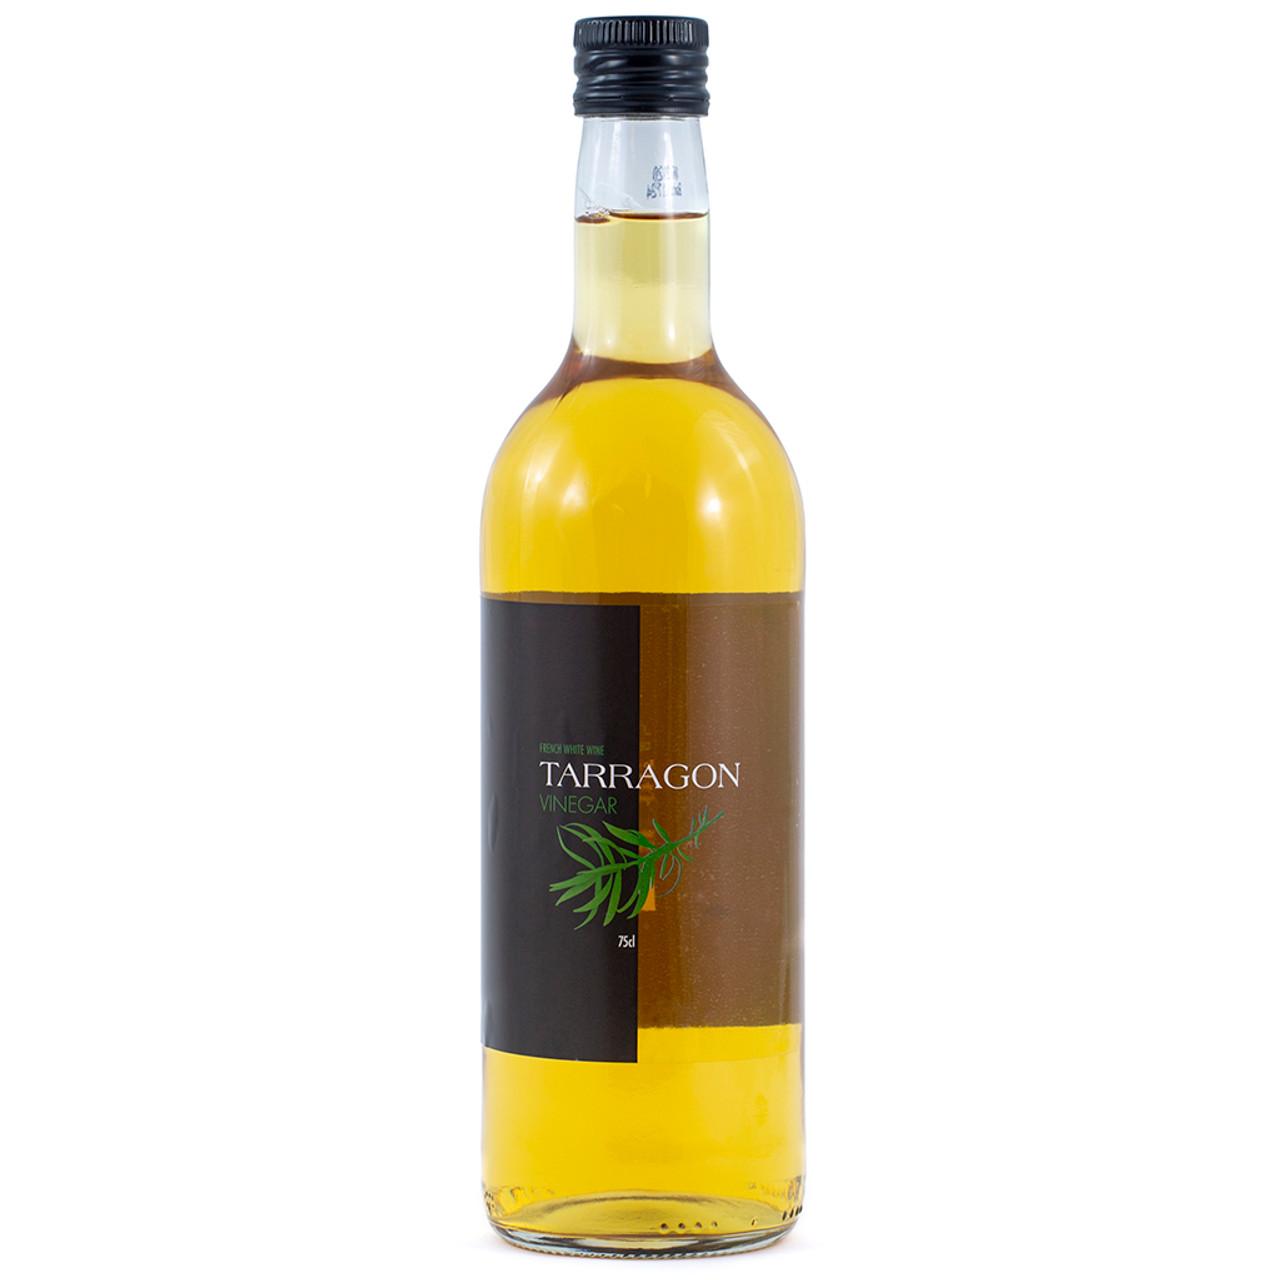 Tarragon Vinegar - 750ml